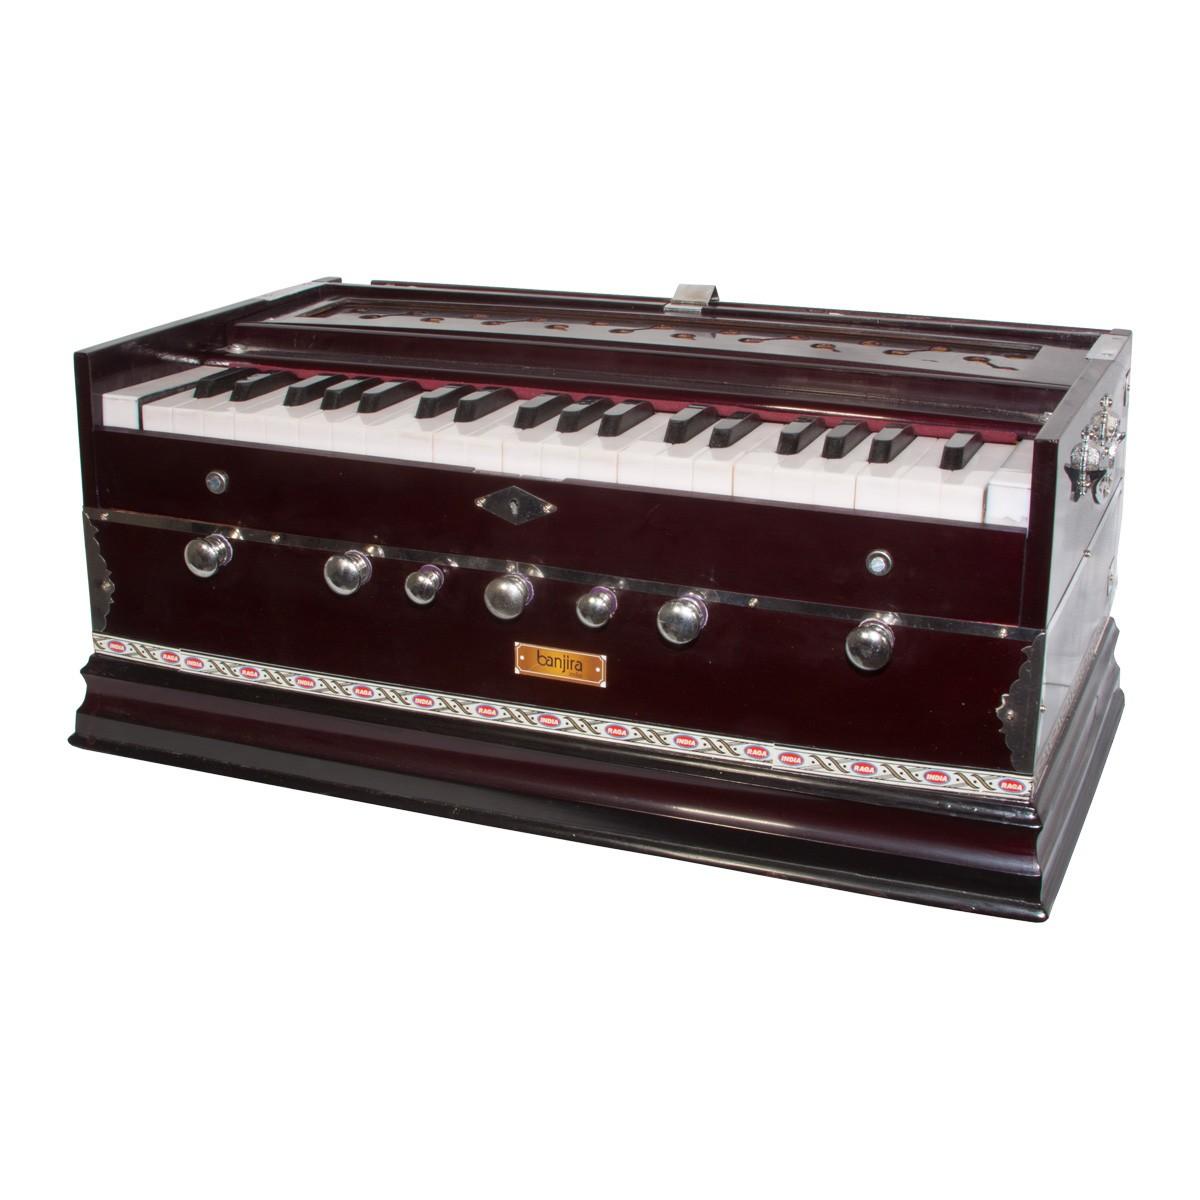 banjira Standard Harmonium 7-Knob A=432 - Dark *Blemished